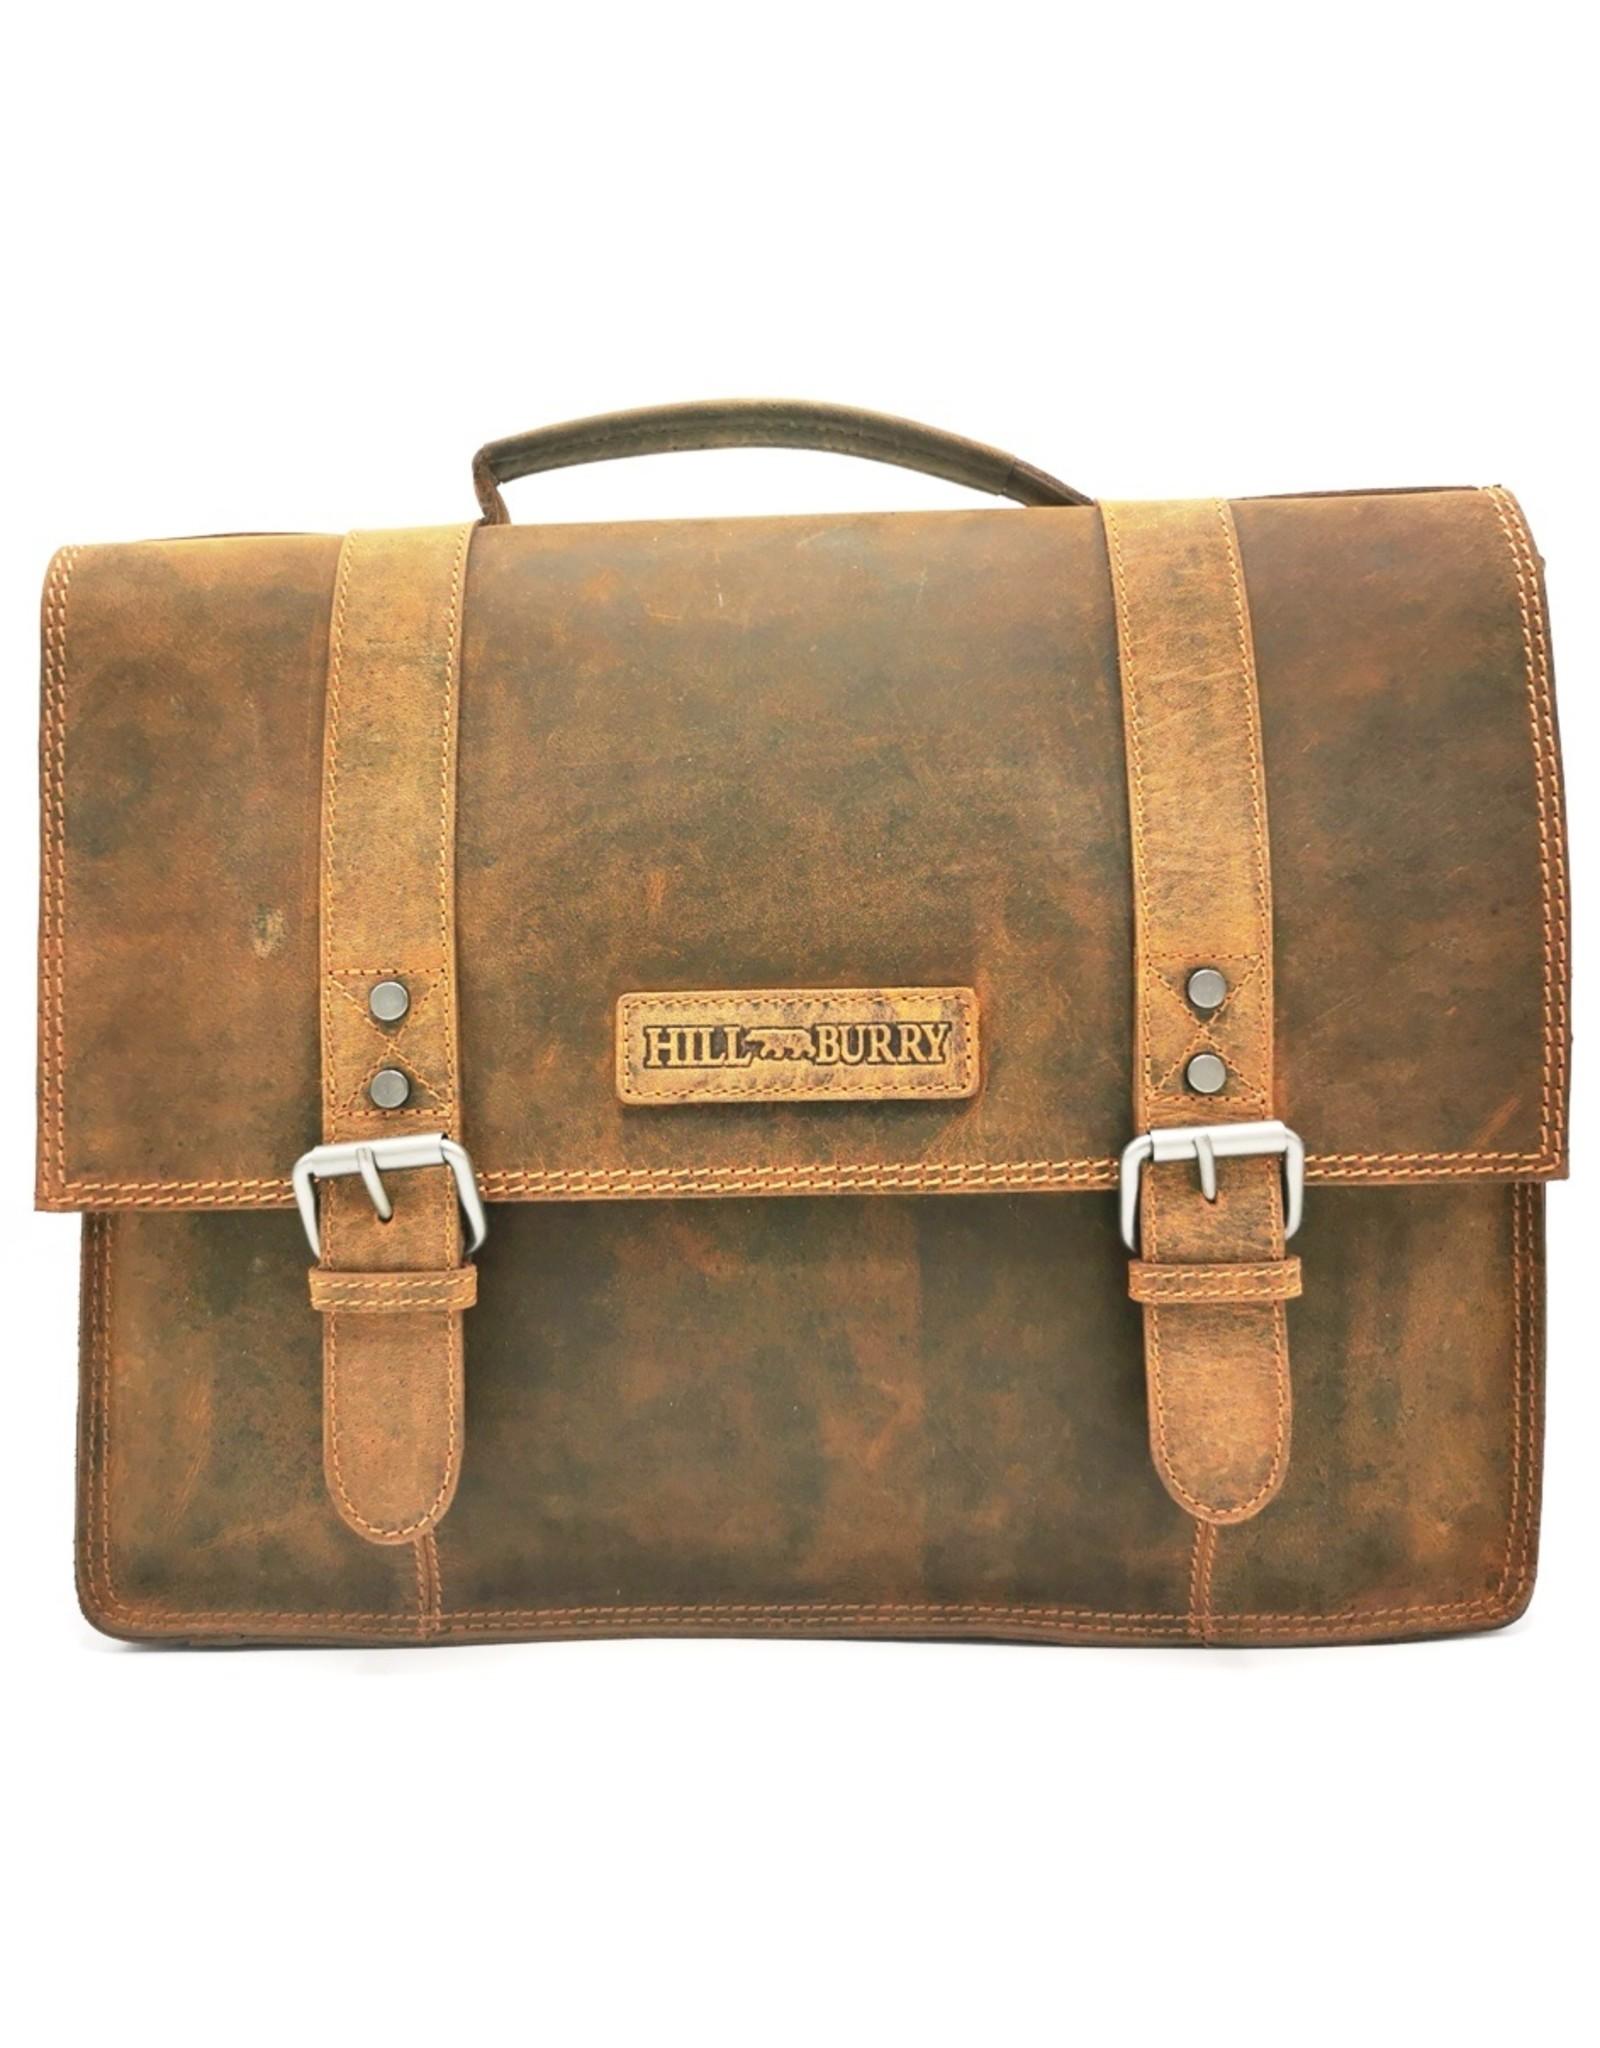 HillBurry Leather laptop bags - HillBurry Leather Vintage Schoolbag XL (Tan)